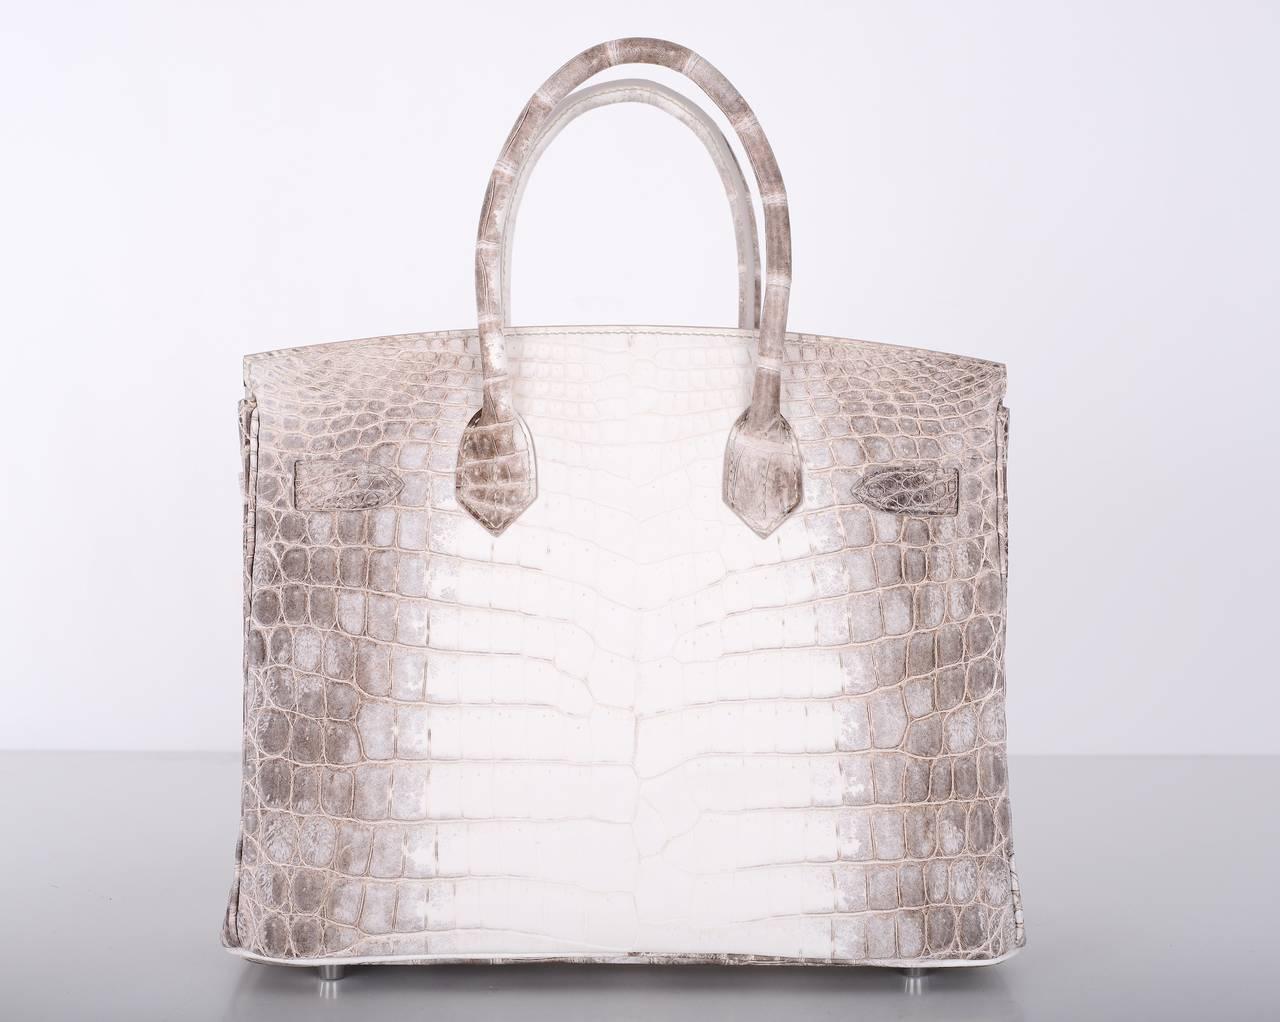 HERMES BIRKIN BAG 25cm HIMALAYAN WHITE NILO CROCODILE JaneFinds ...